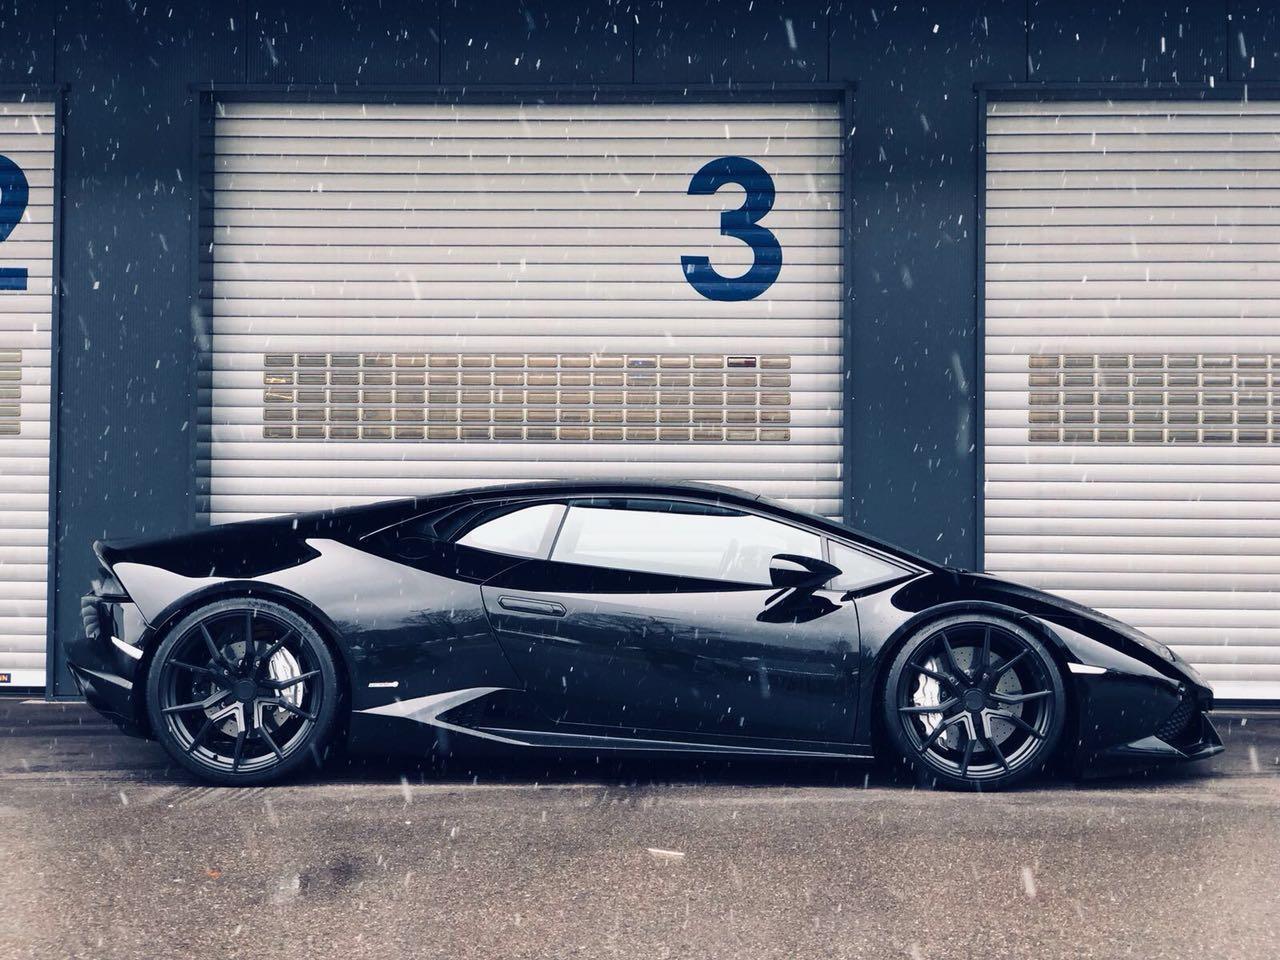 Lamborghini Huracan Black Rims Varro VD19 Concave Wheels